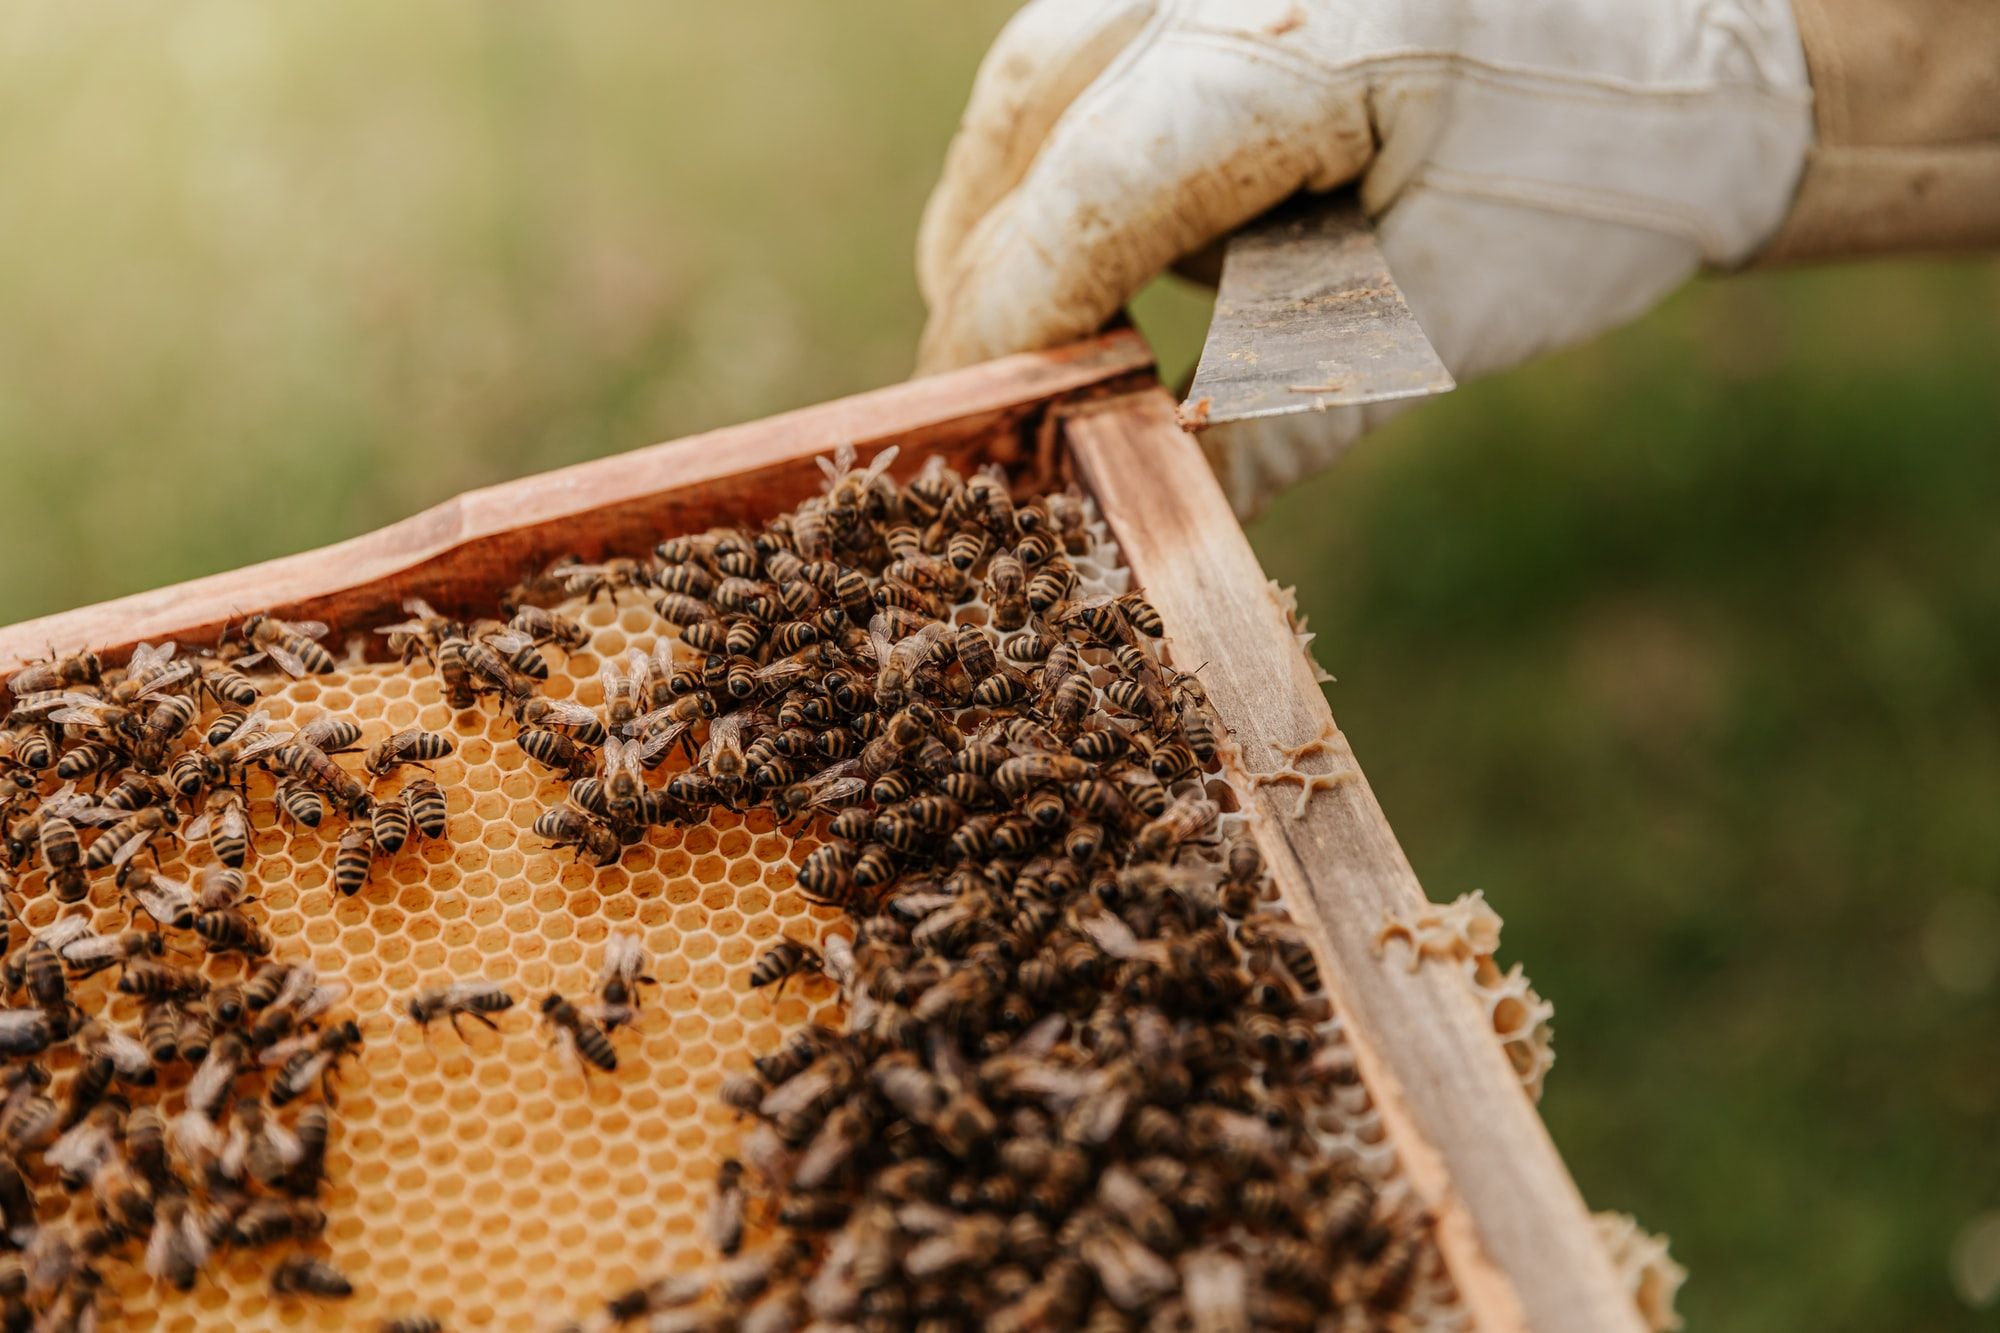 Bizzy beekeepers in Bharatpur transform rural economic development